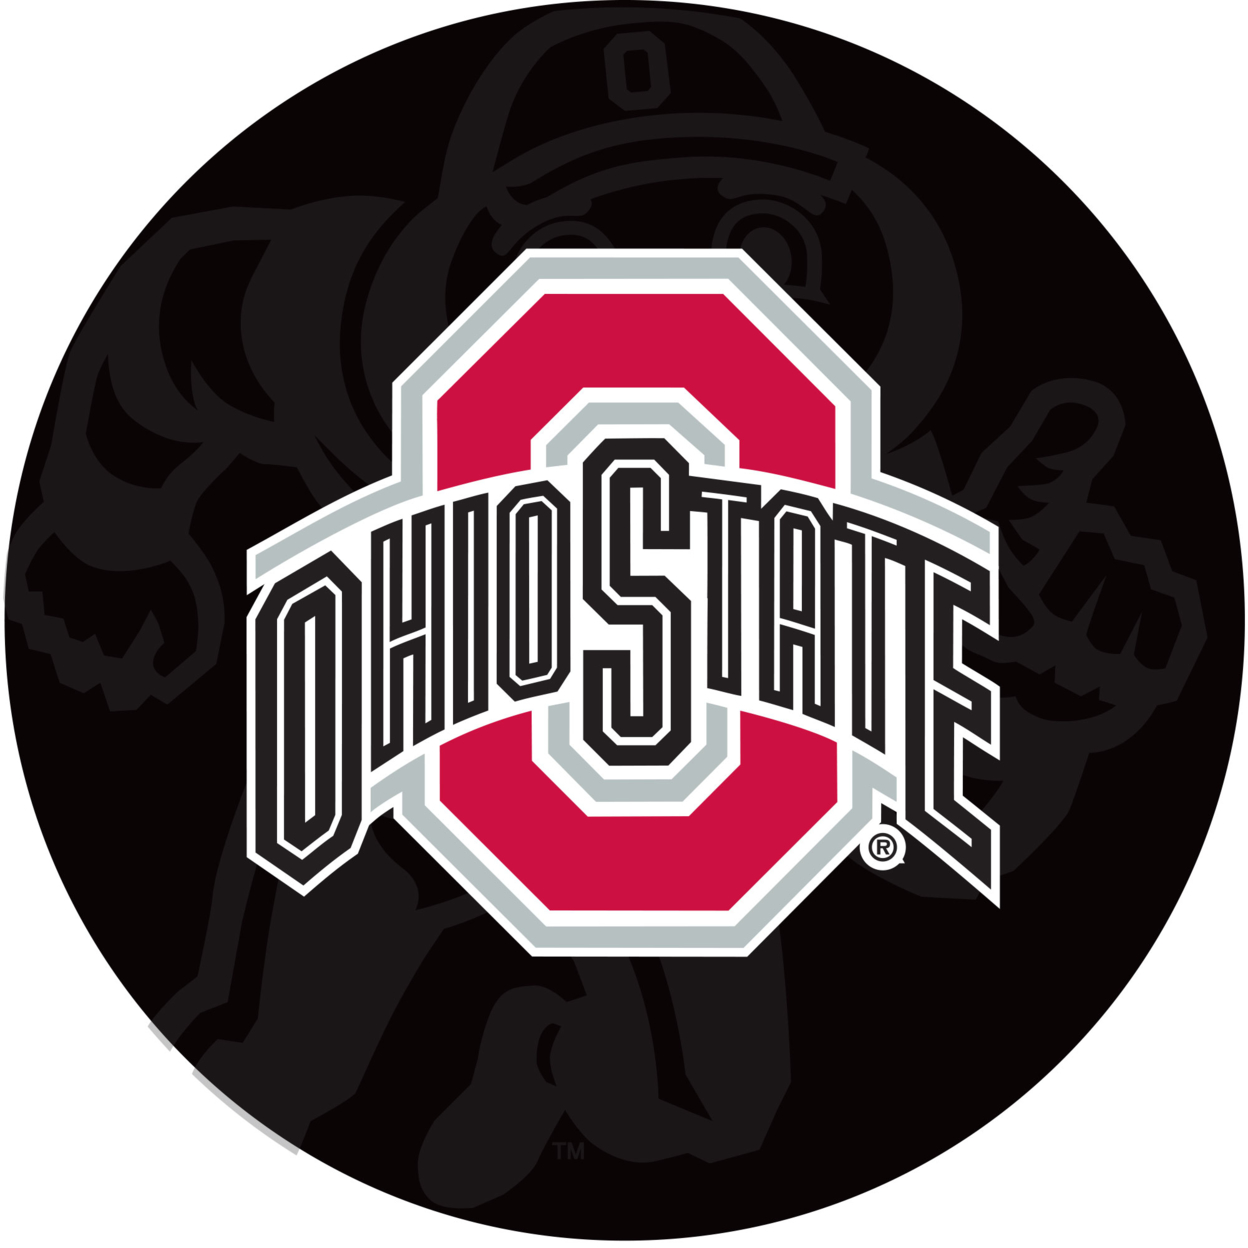 Ohio State Shadow Brutus Chrome 42 Inch Pub Table ботинки meindl meindl ohio 2 gtx® женские